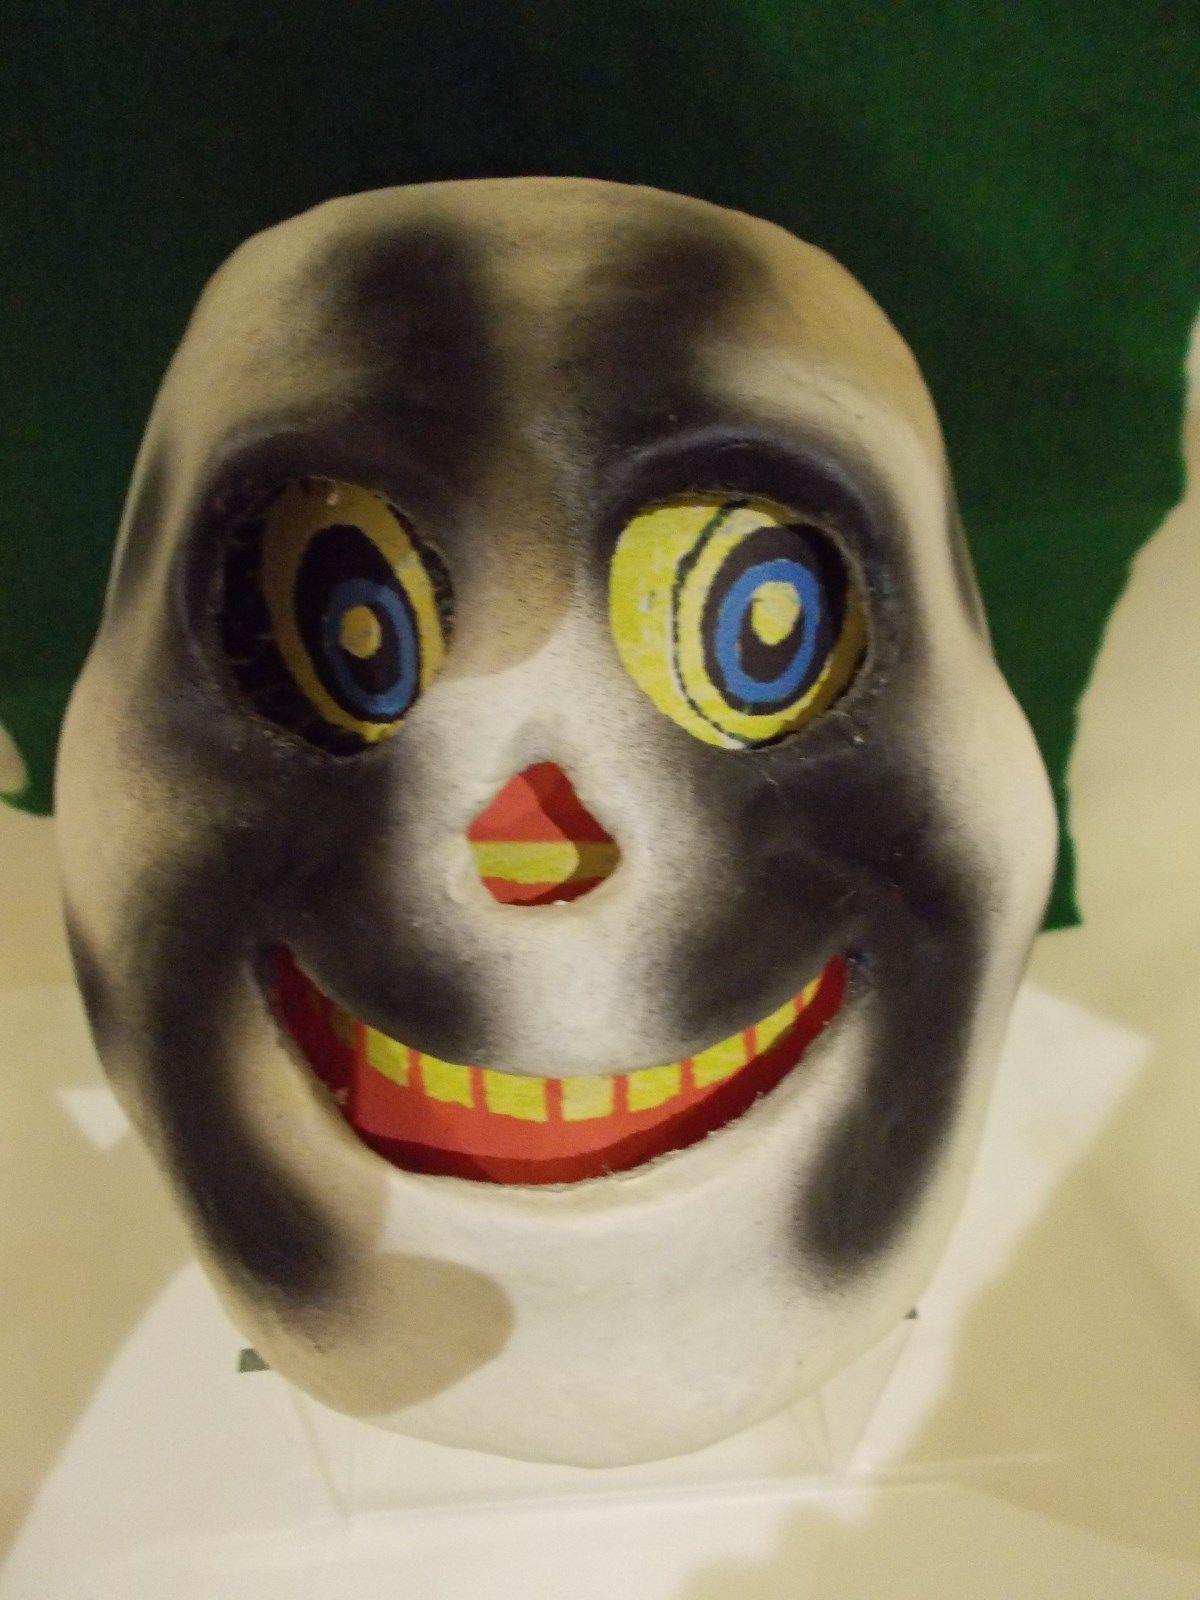 Vintage scary halloween boooooo ghost lantern style candy